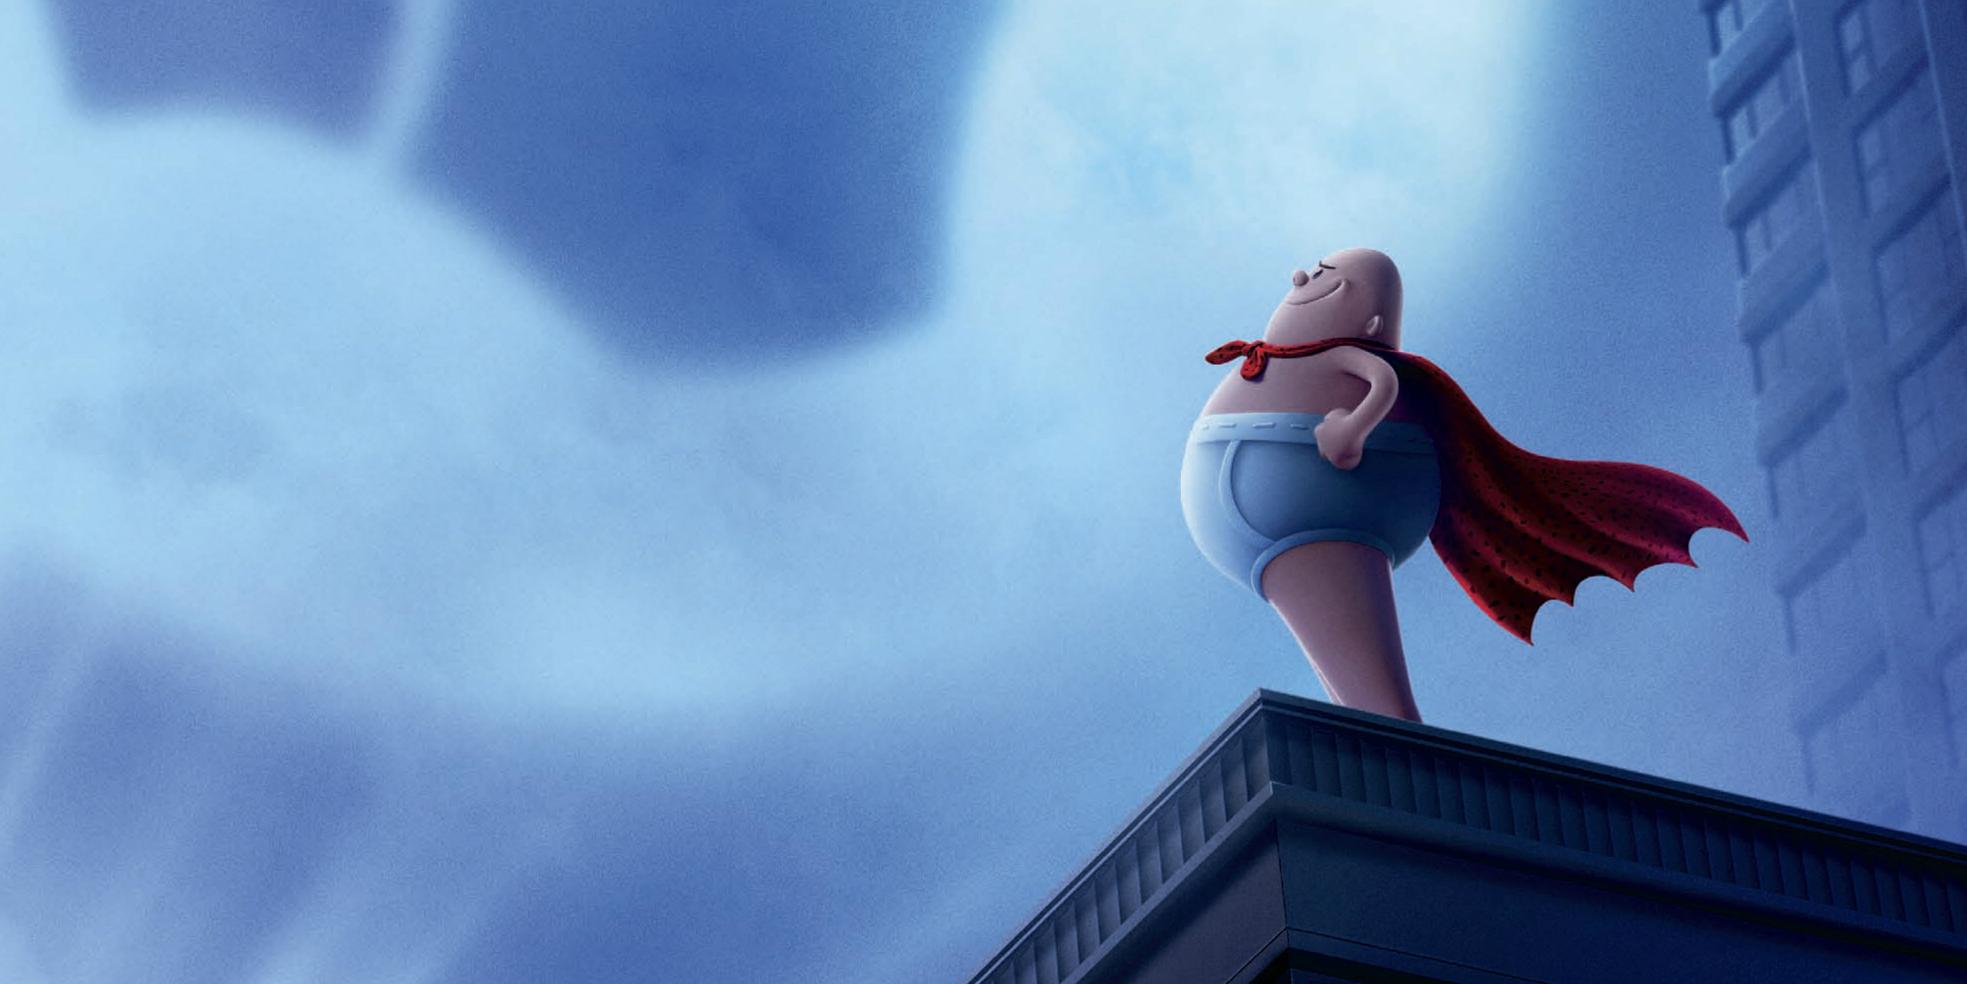 Captain Underpants Summer Movie Preview